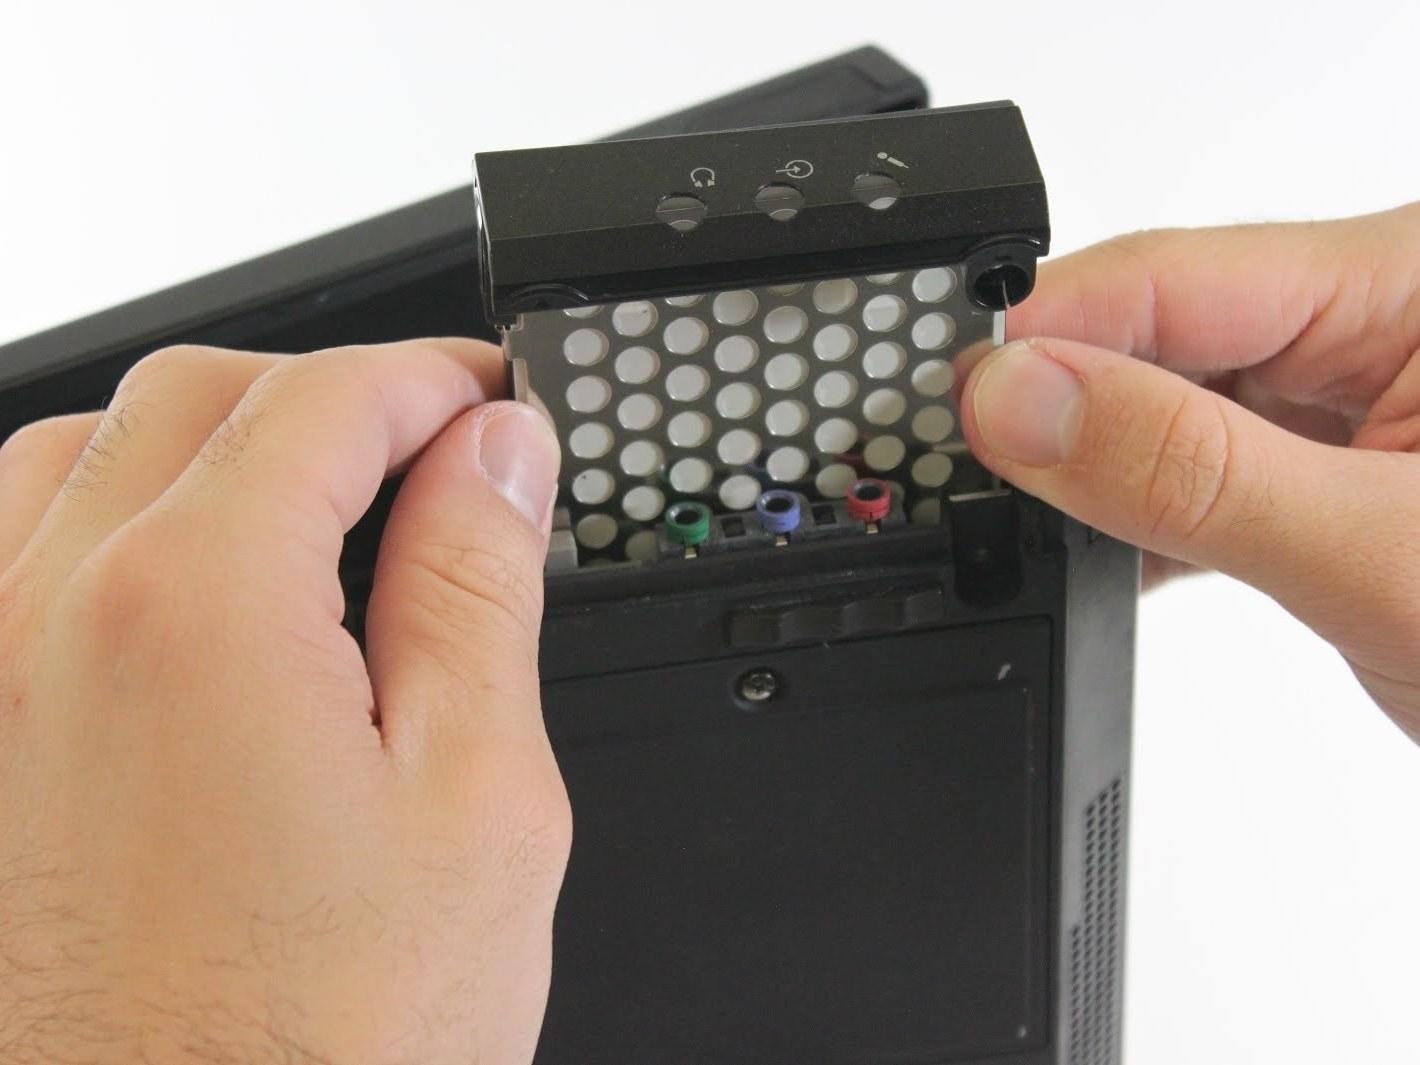 Ibm thinkpad r31 laptop disassembly | service manual.